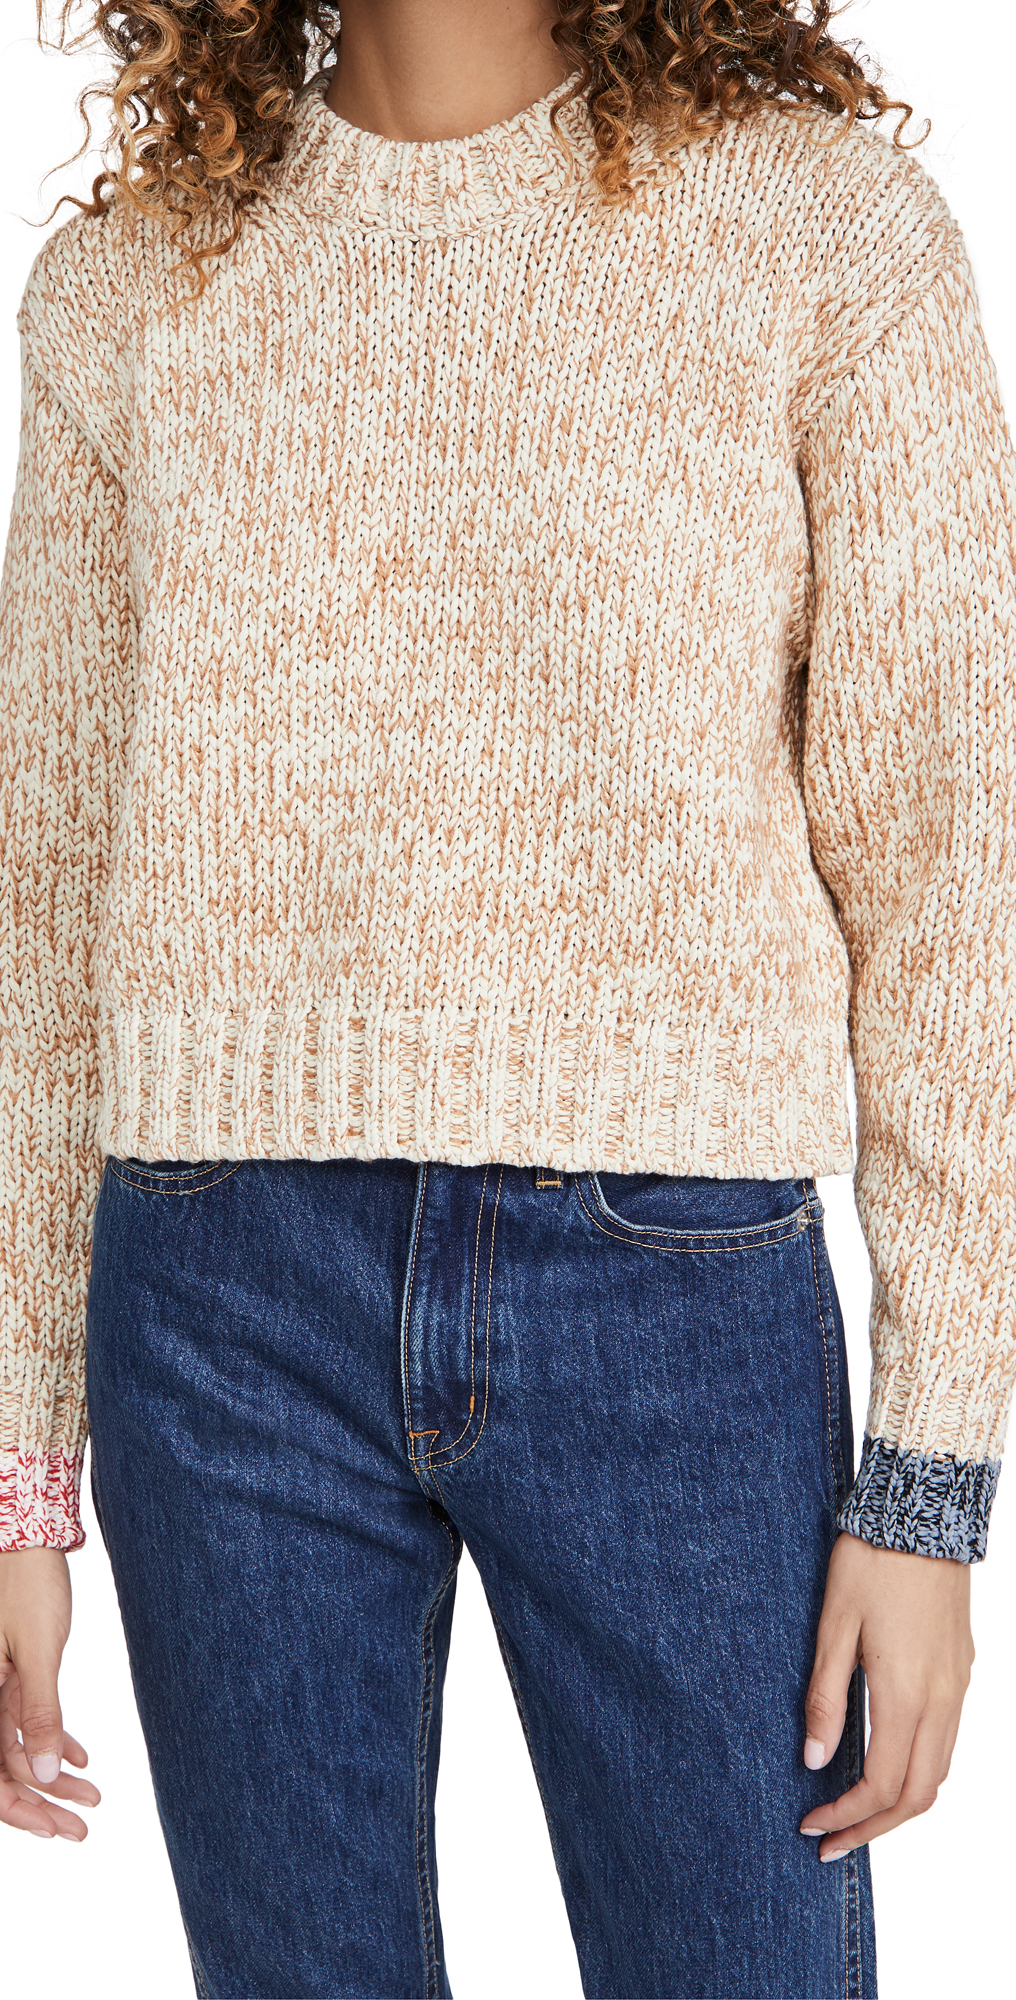 Acne Studios Spongy Knit Sweater